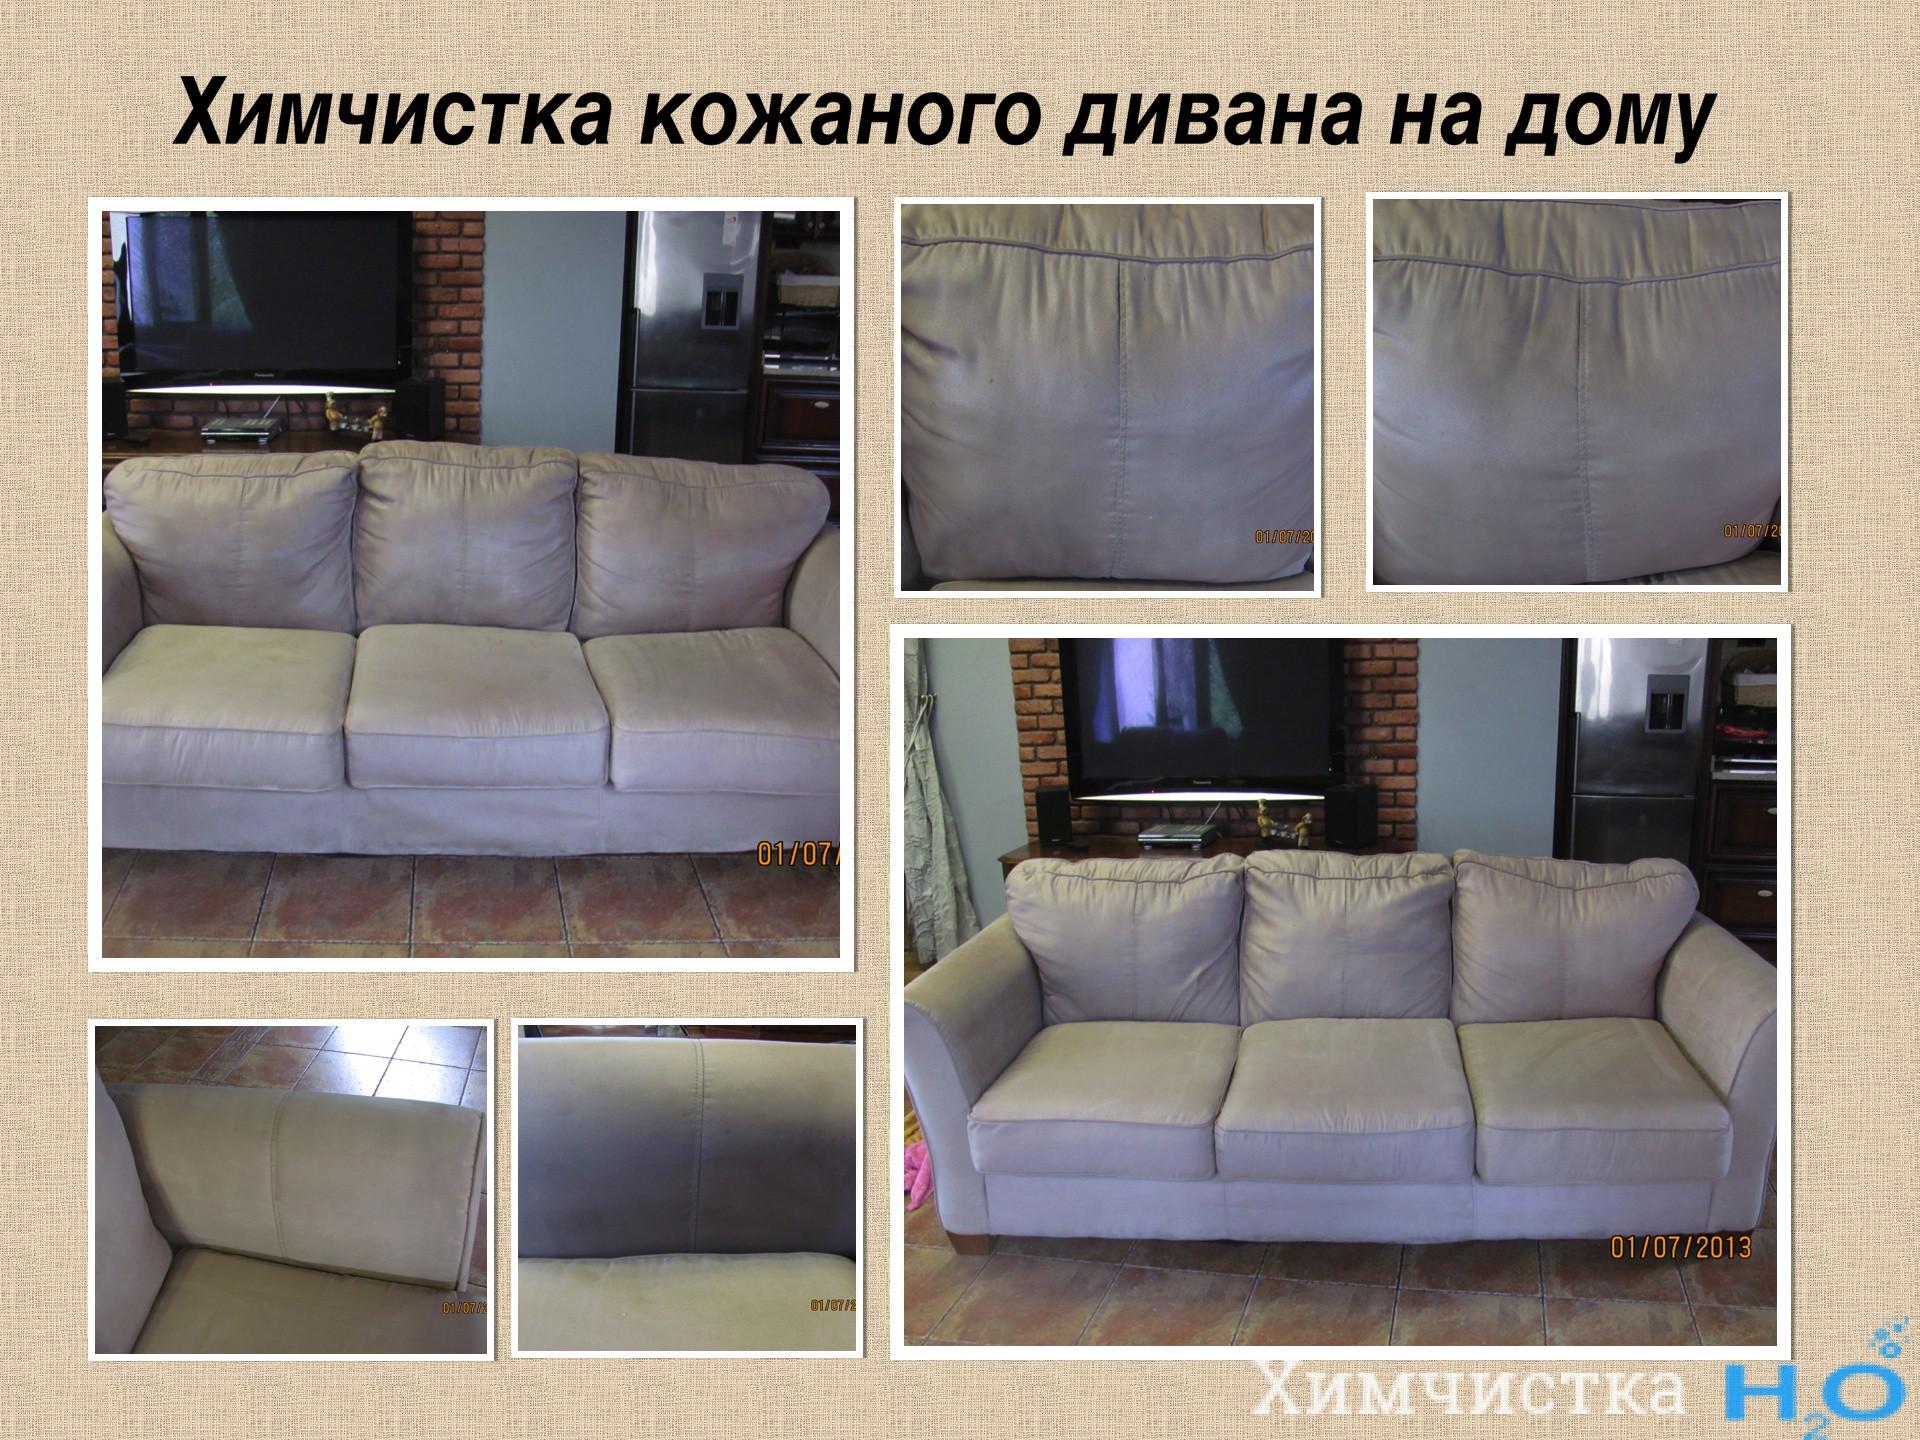 Химчистка кожаного дивана на дому в Одессе